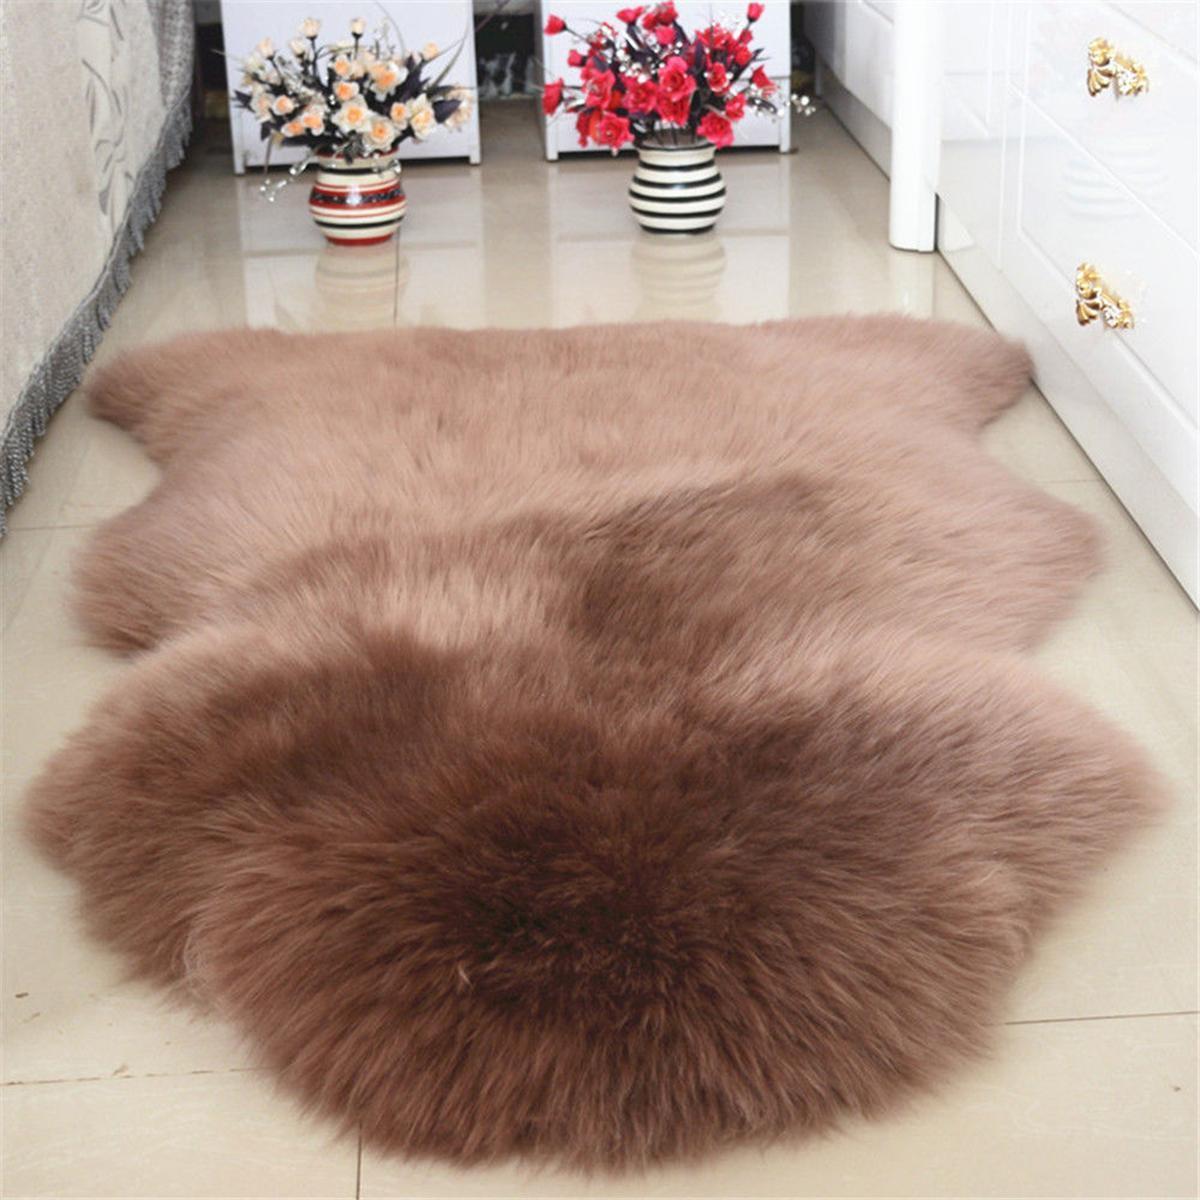 Fluffy Faux Fur Skin Rug Soft Fake Mats Bedroom Rugs Carpet Brown Shaggy